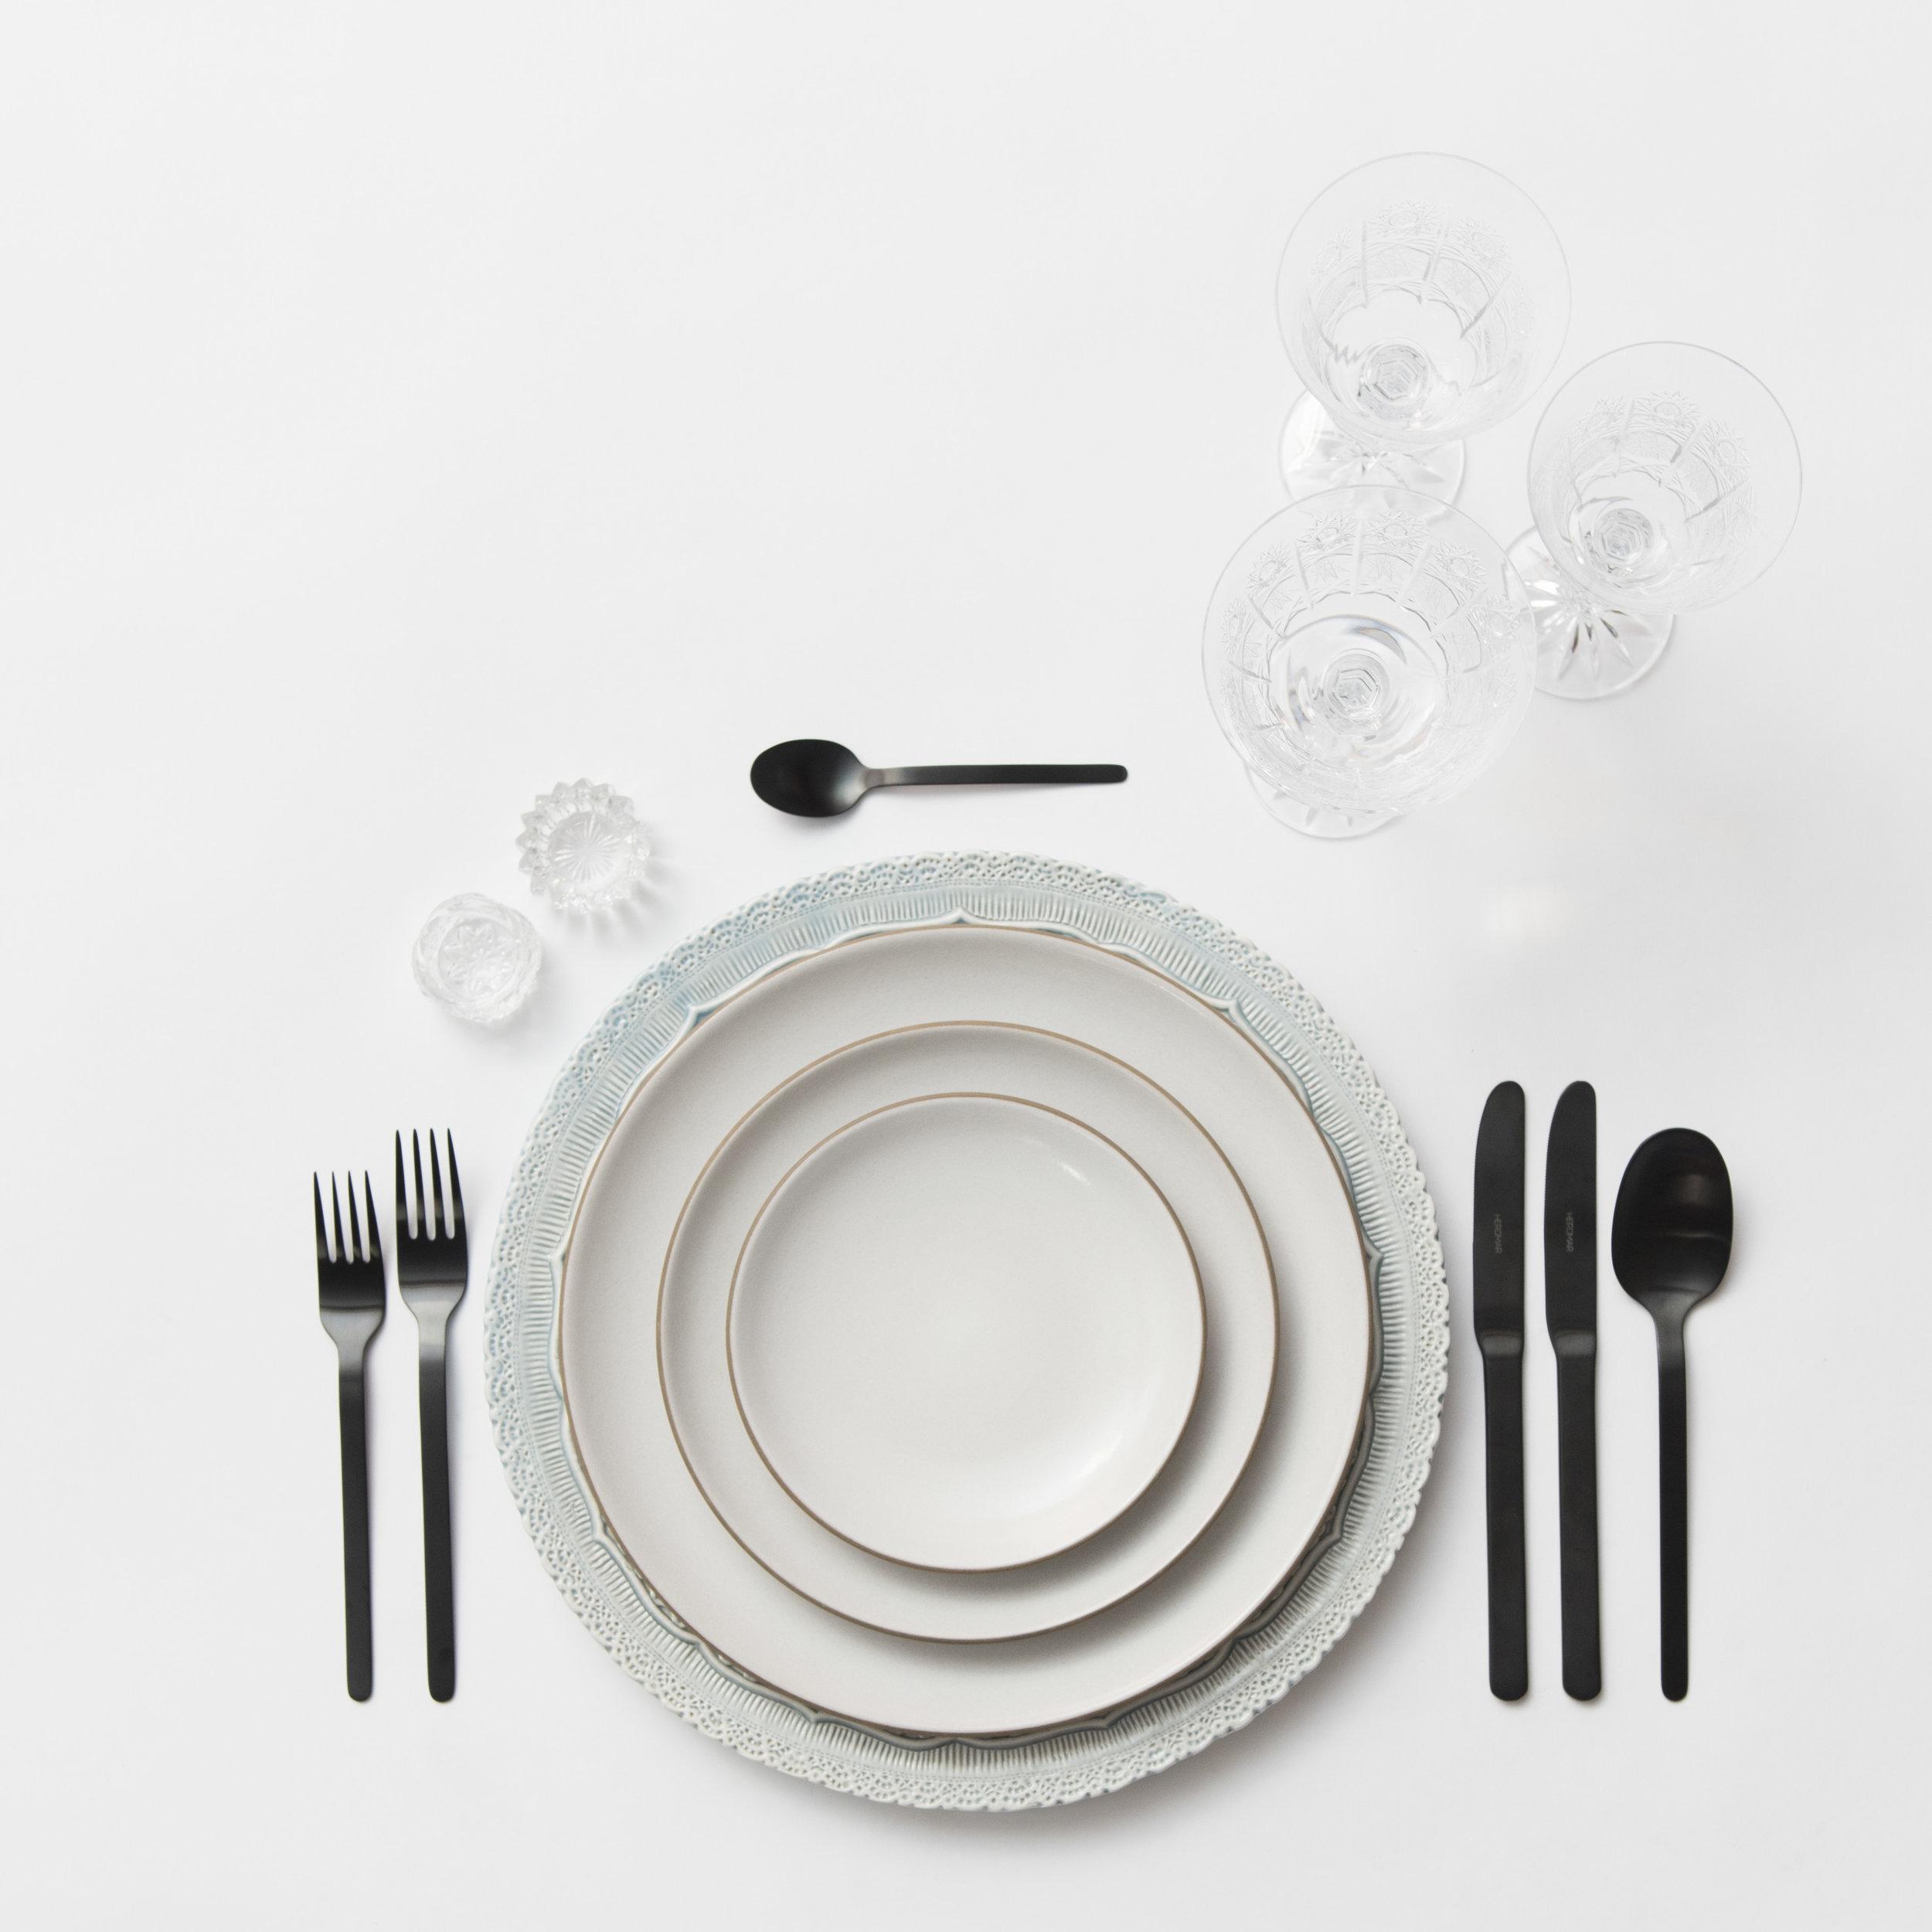 RENT: Lace Chargers in Dusty Blue + Heath Ceramics in Opaque White + Finn Flatware in Matte Black + Czech Crystal Stemware + Antique Crystal Salt Cellars